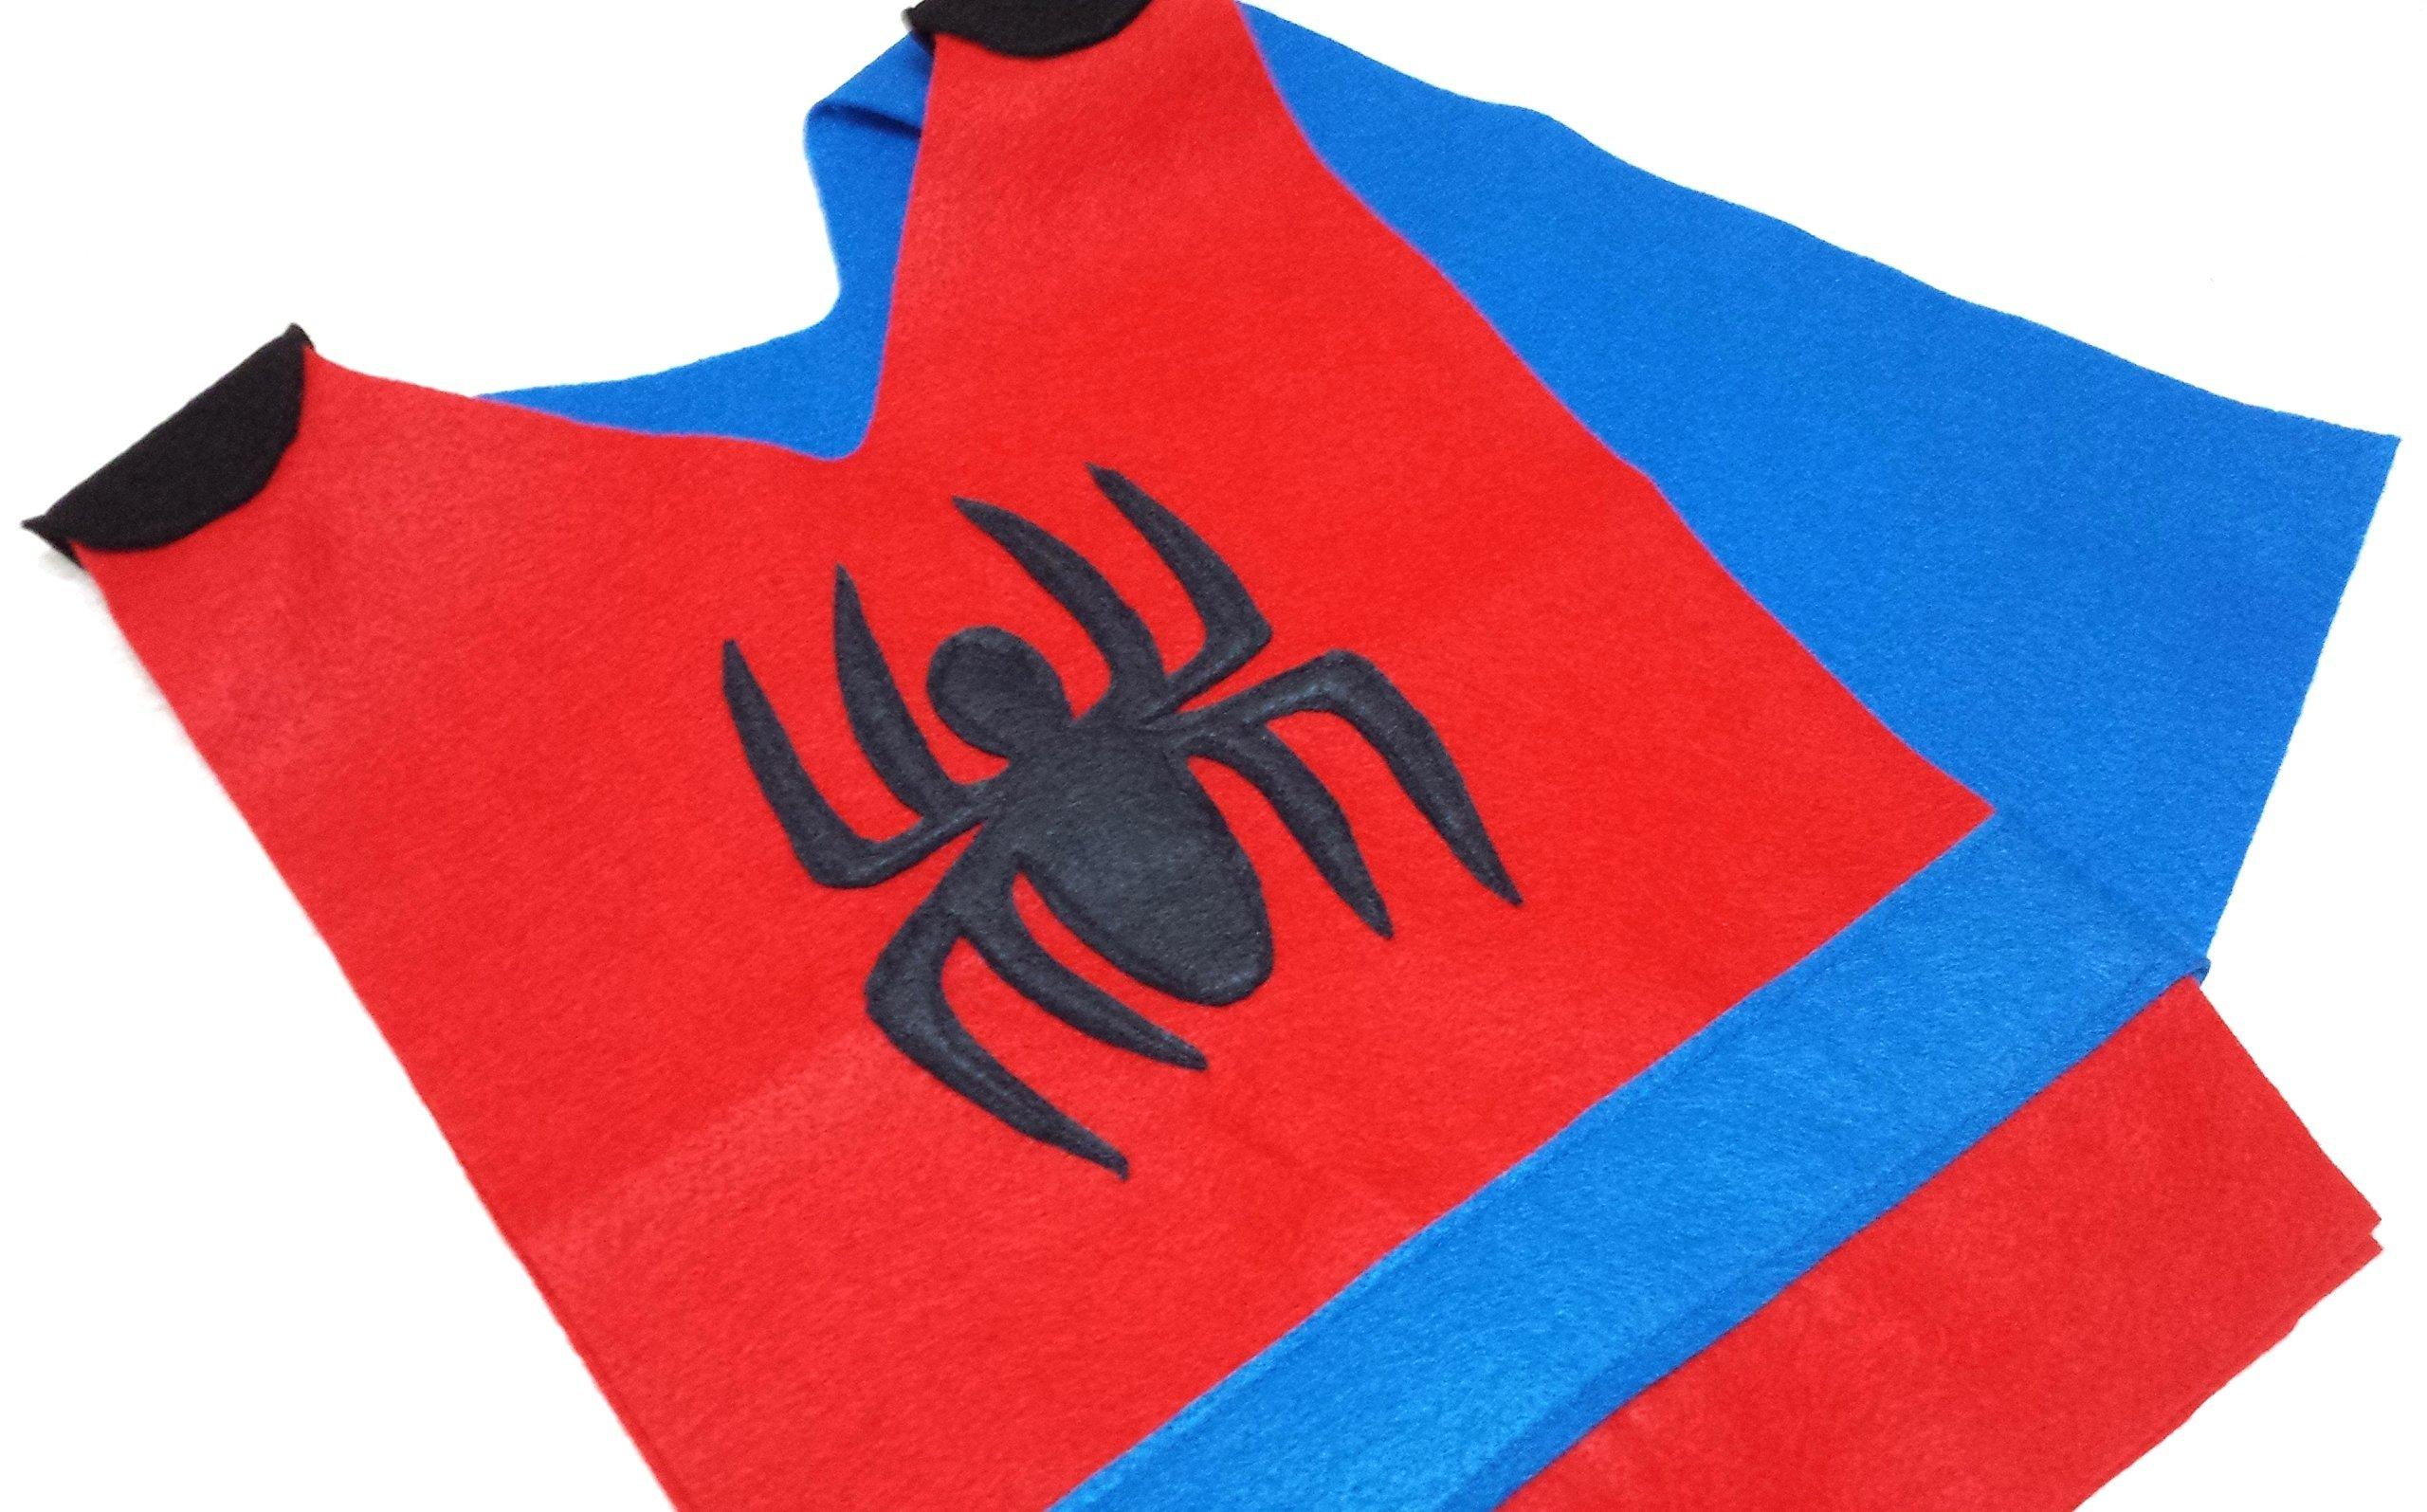 Kids Spider-Man Costume Tunic (Marvel/Avengers/Infinity War) - Baby/Toddler/Kids/Teens/Adult Sizes